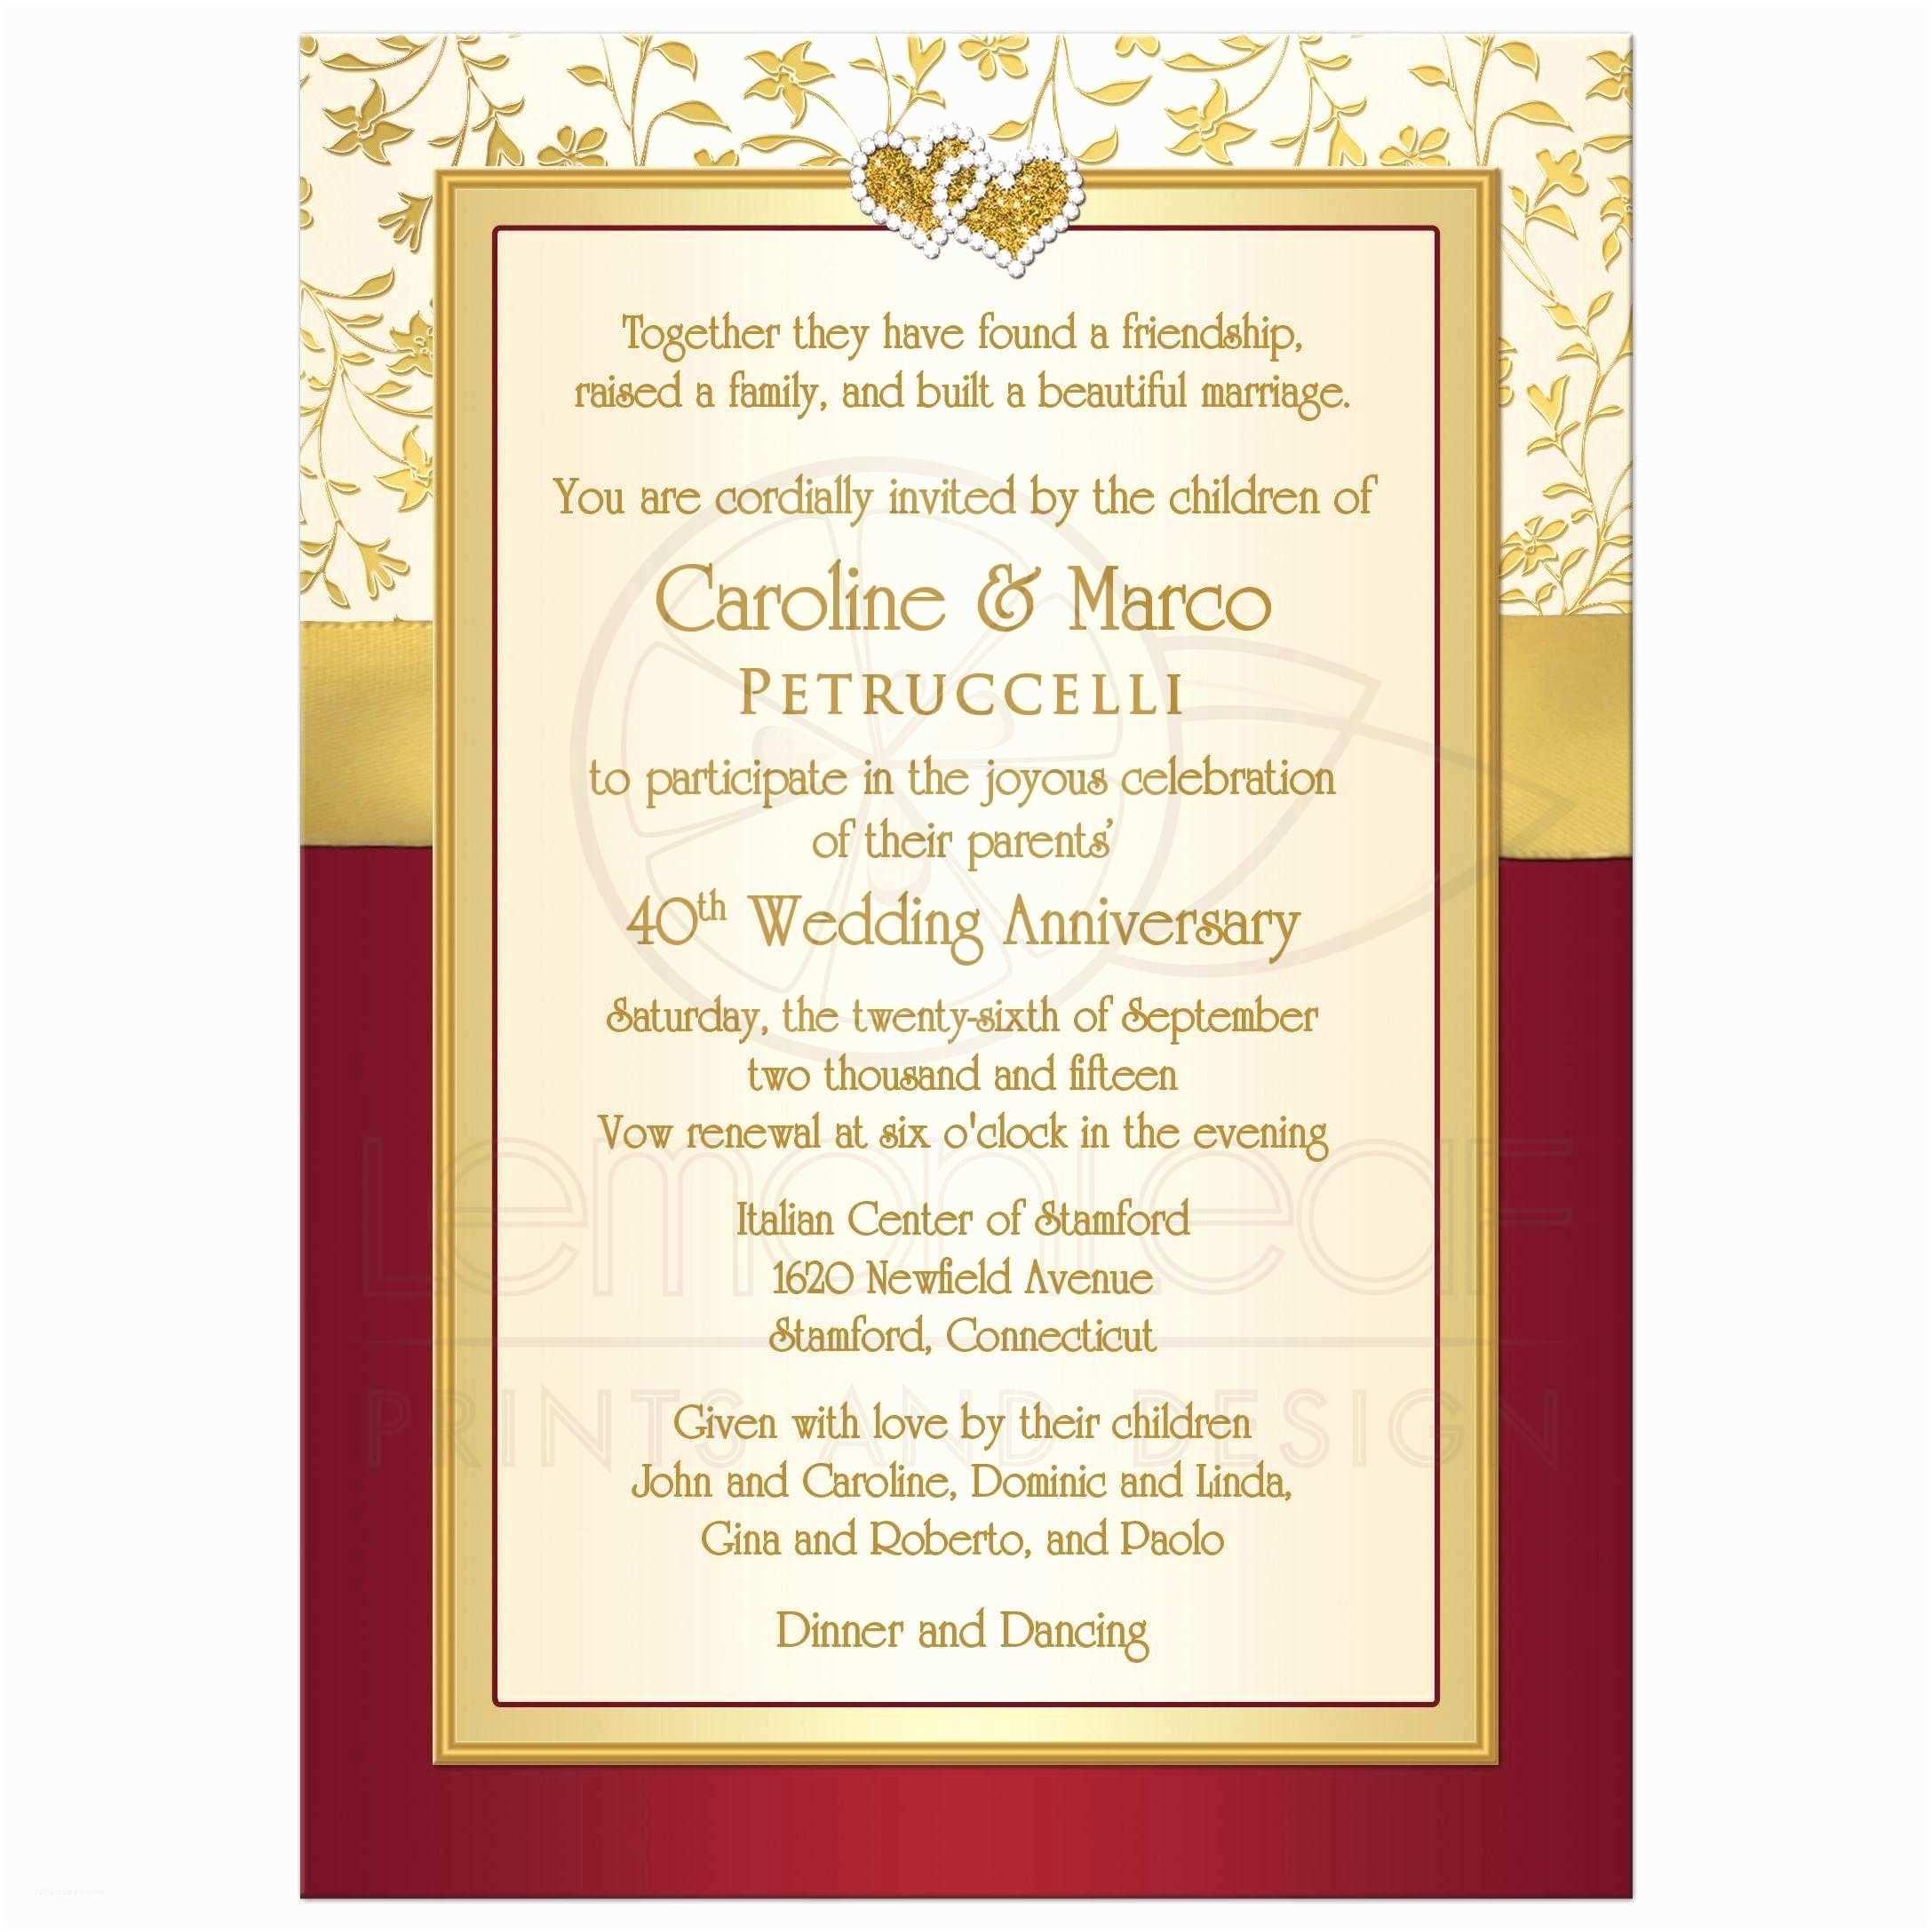 Red Ivory and Gold Wedding Invitations 40th Wedding Anniversary Invitation